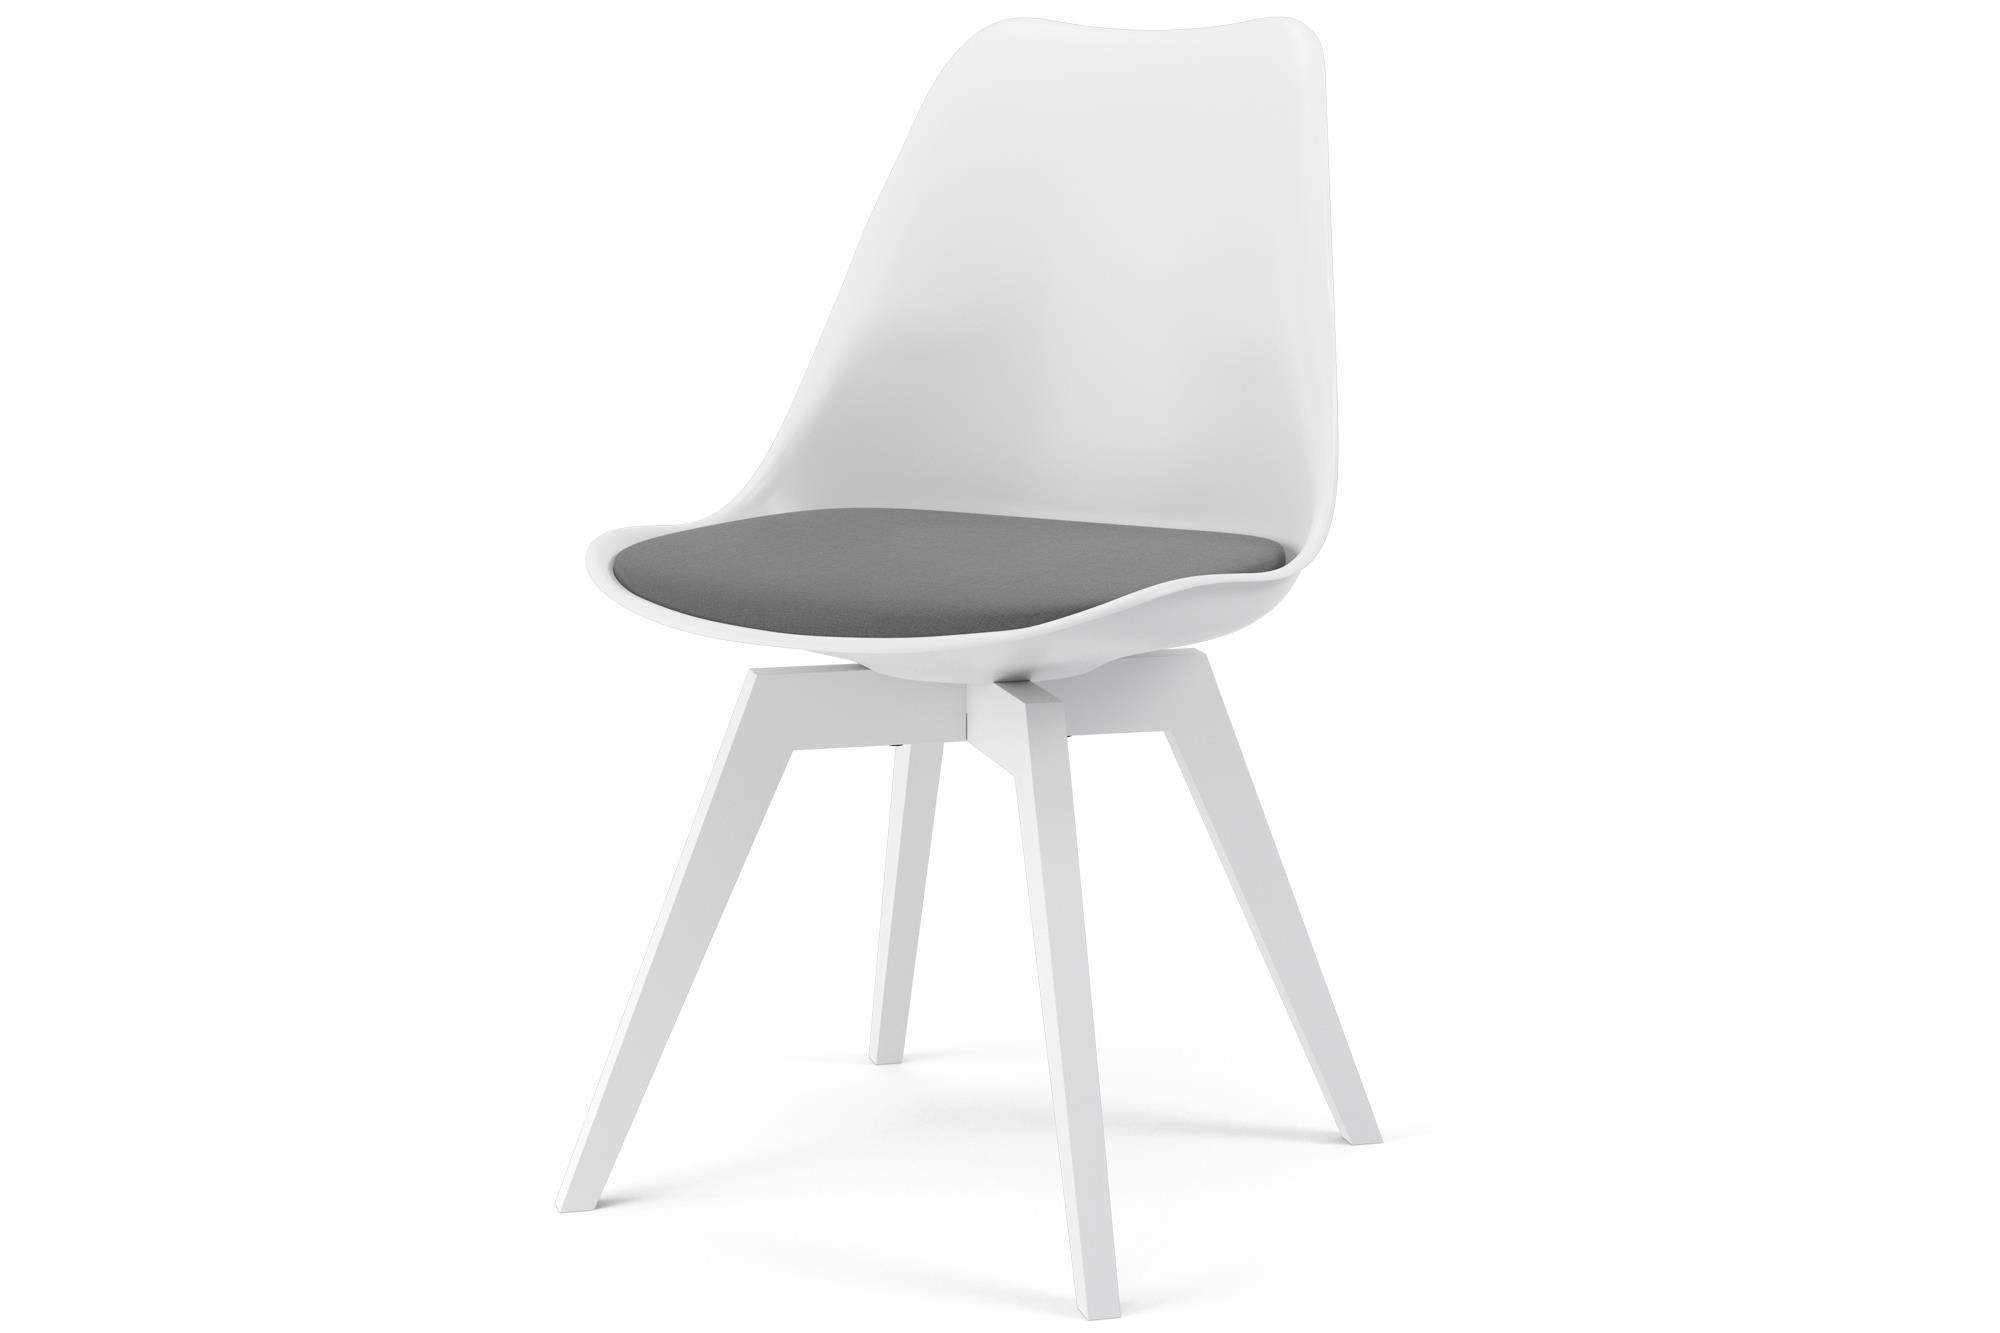 Tenzo 2x Stuhl Bess Mit Gina ABS Kunststoff In